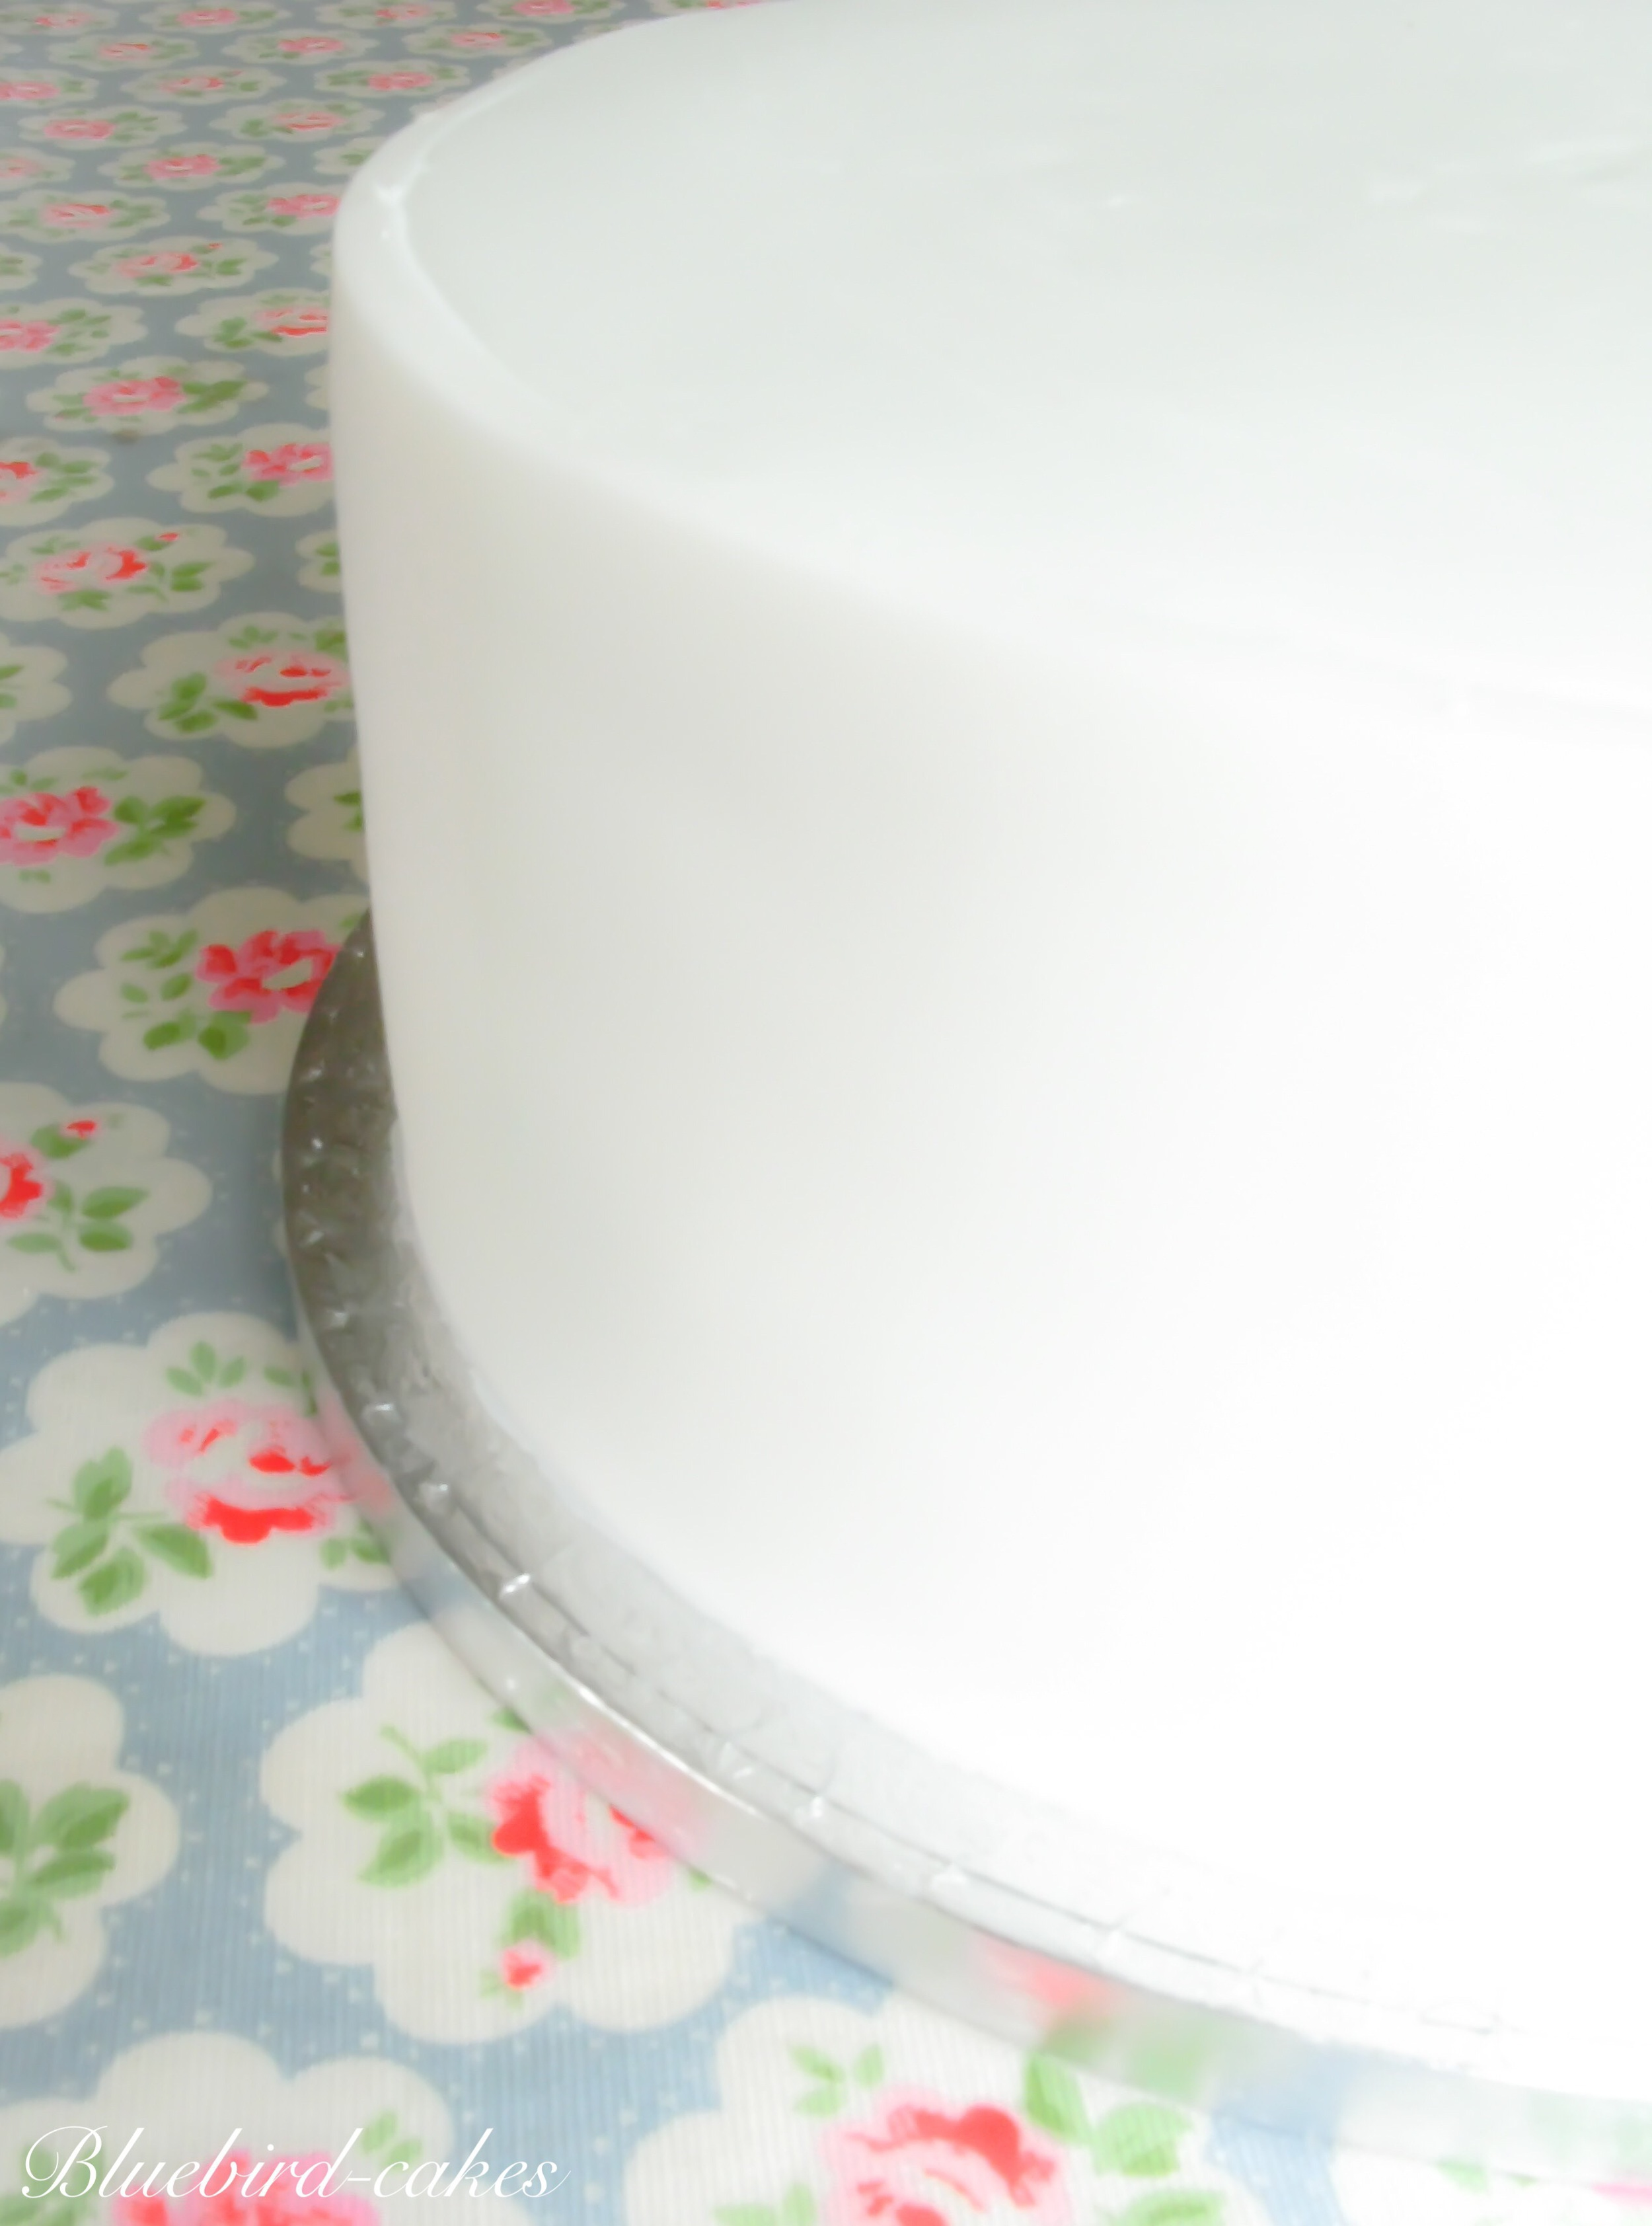 Fondant iced cake